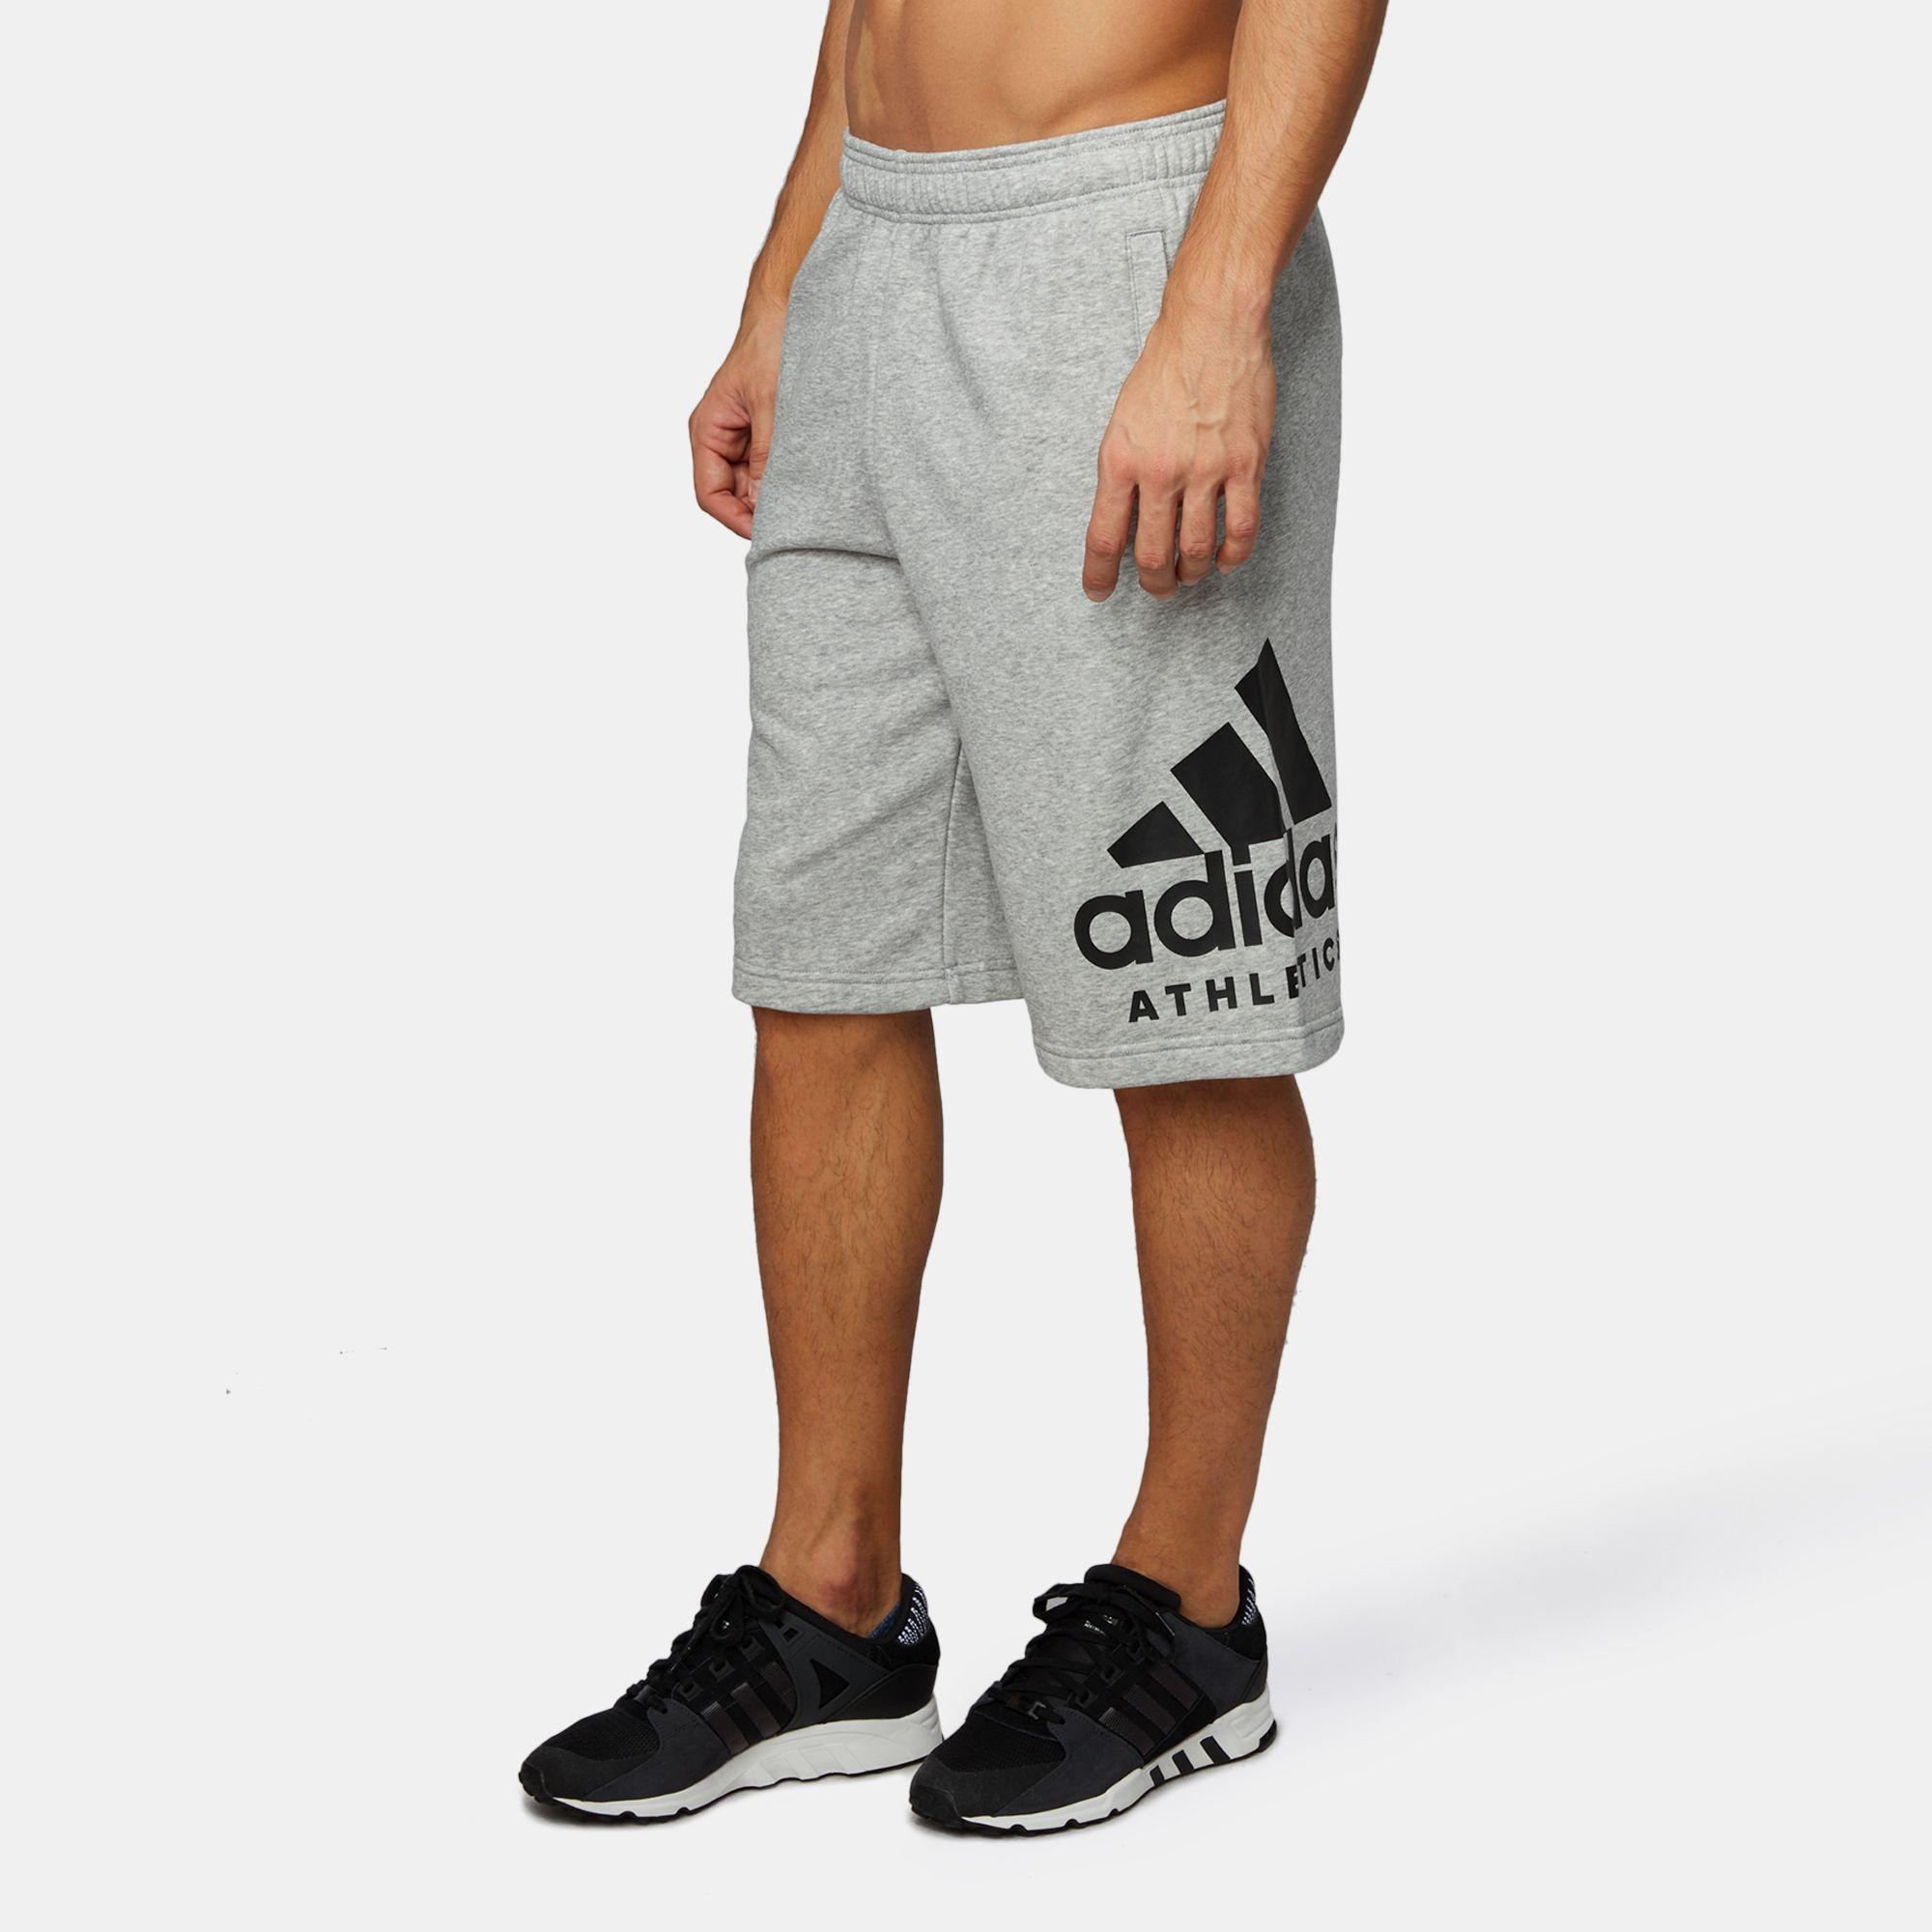 9d7f03000ae09 adidas SID Athletics Logo Shorts | Shorts | Clothing | Men's Sale ...